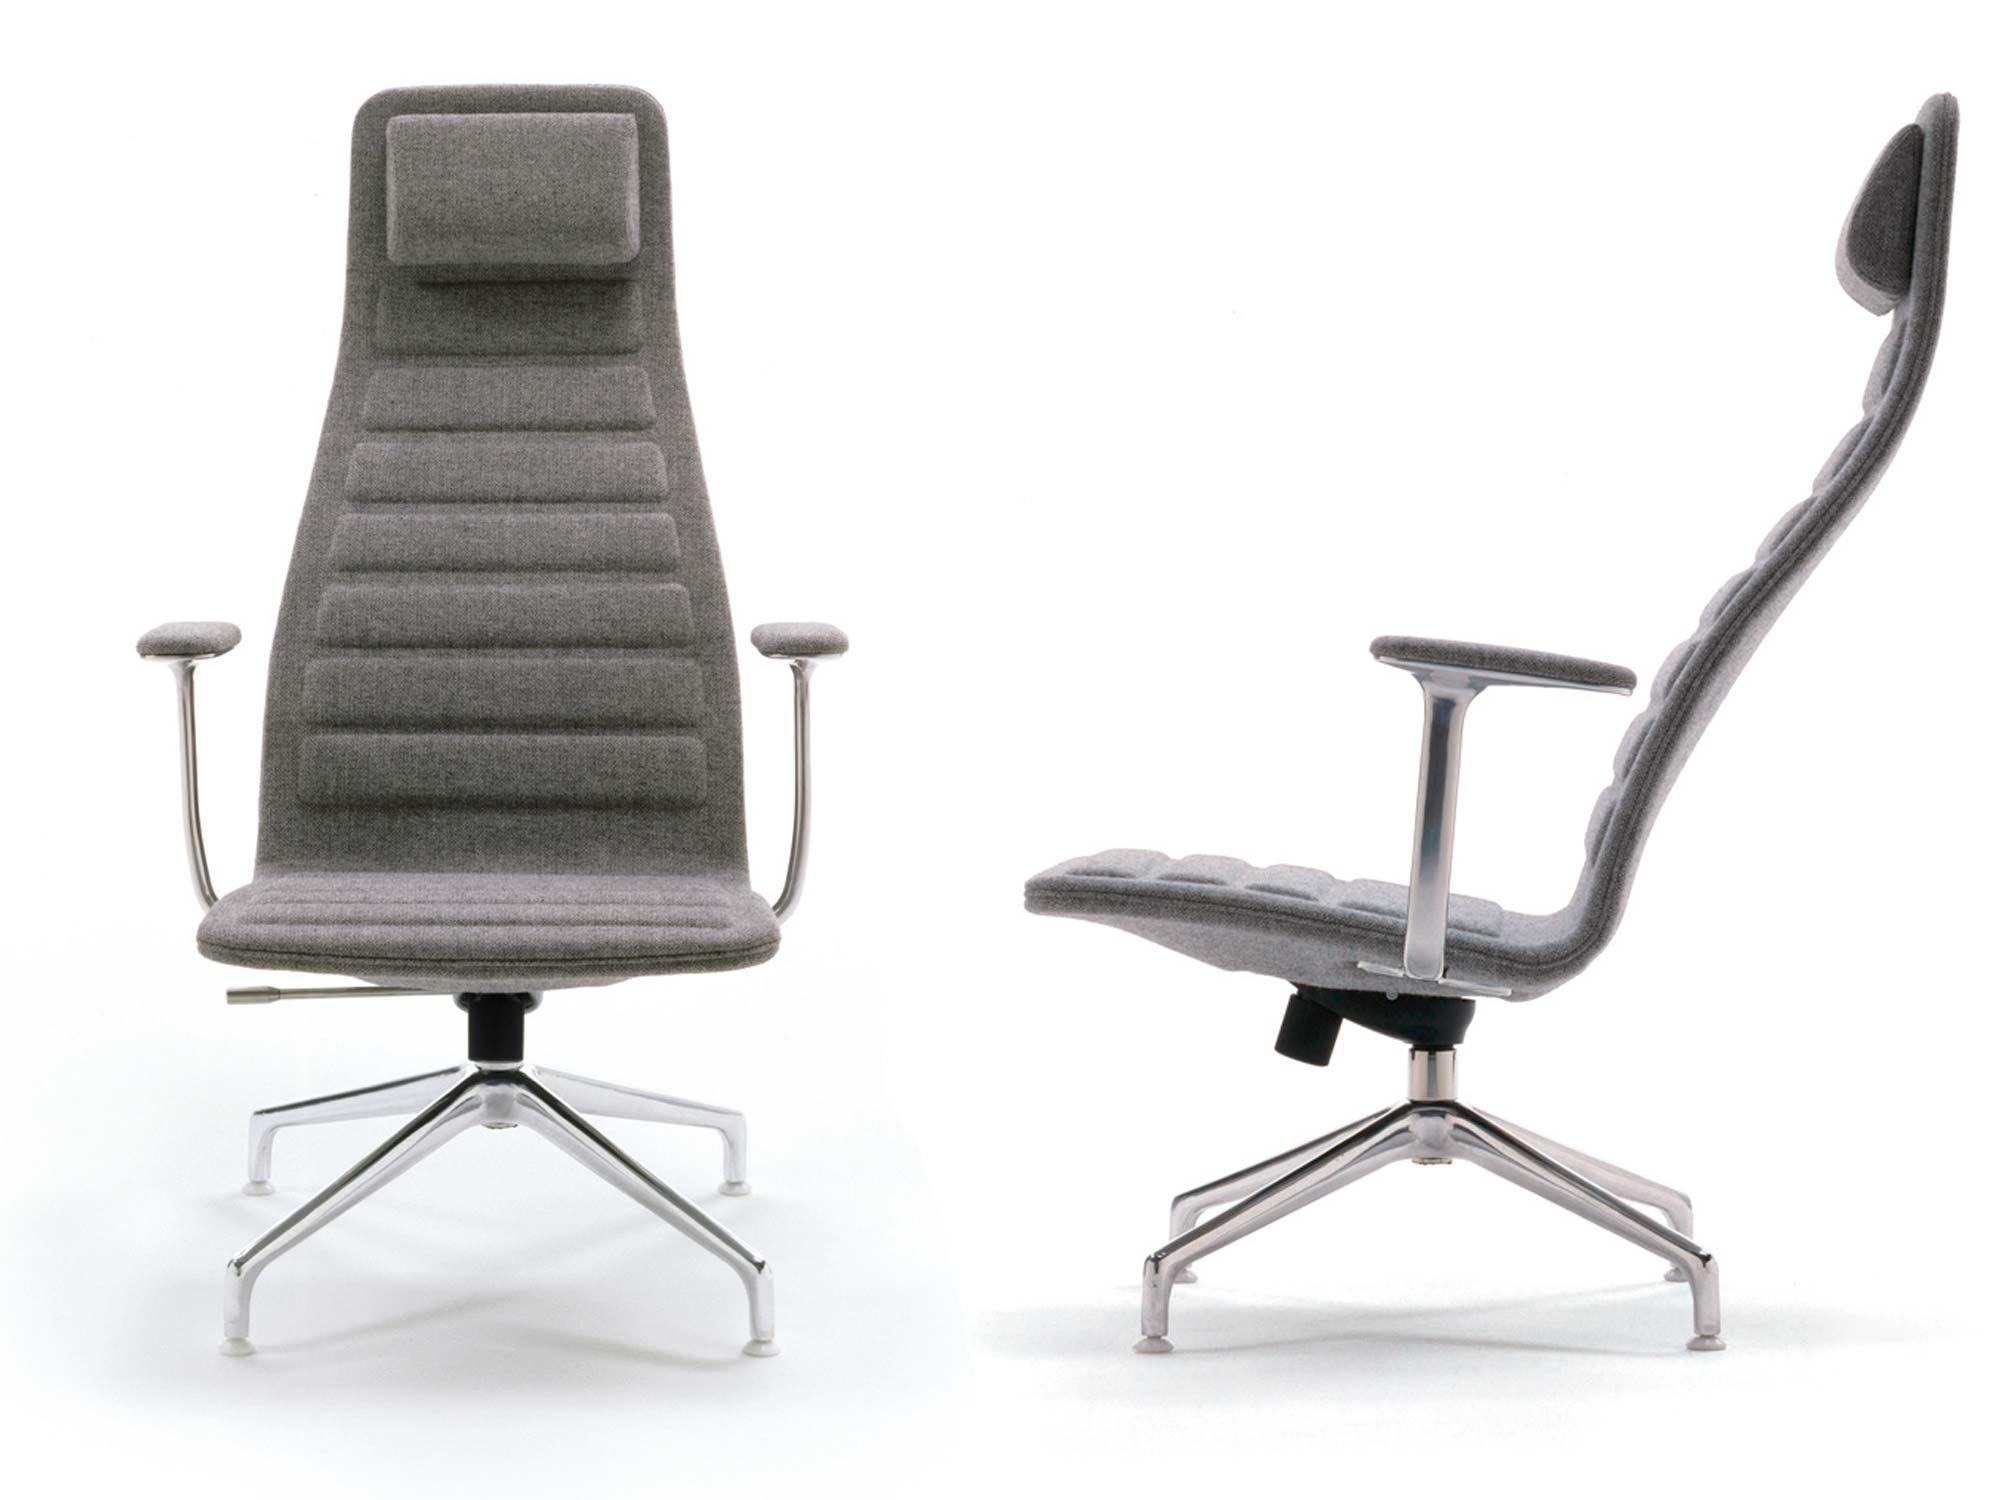 Jasper Morrison Lotus Chairs Pinterest Lotus And Bed Sofa # Muebles Sedutti